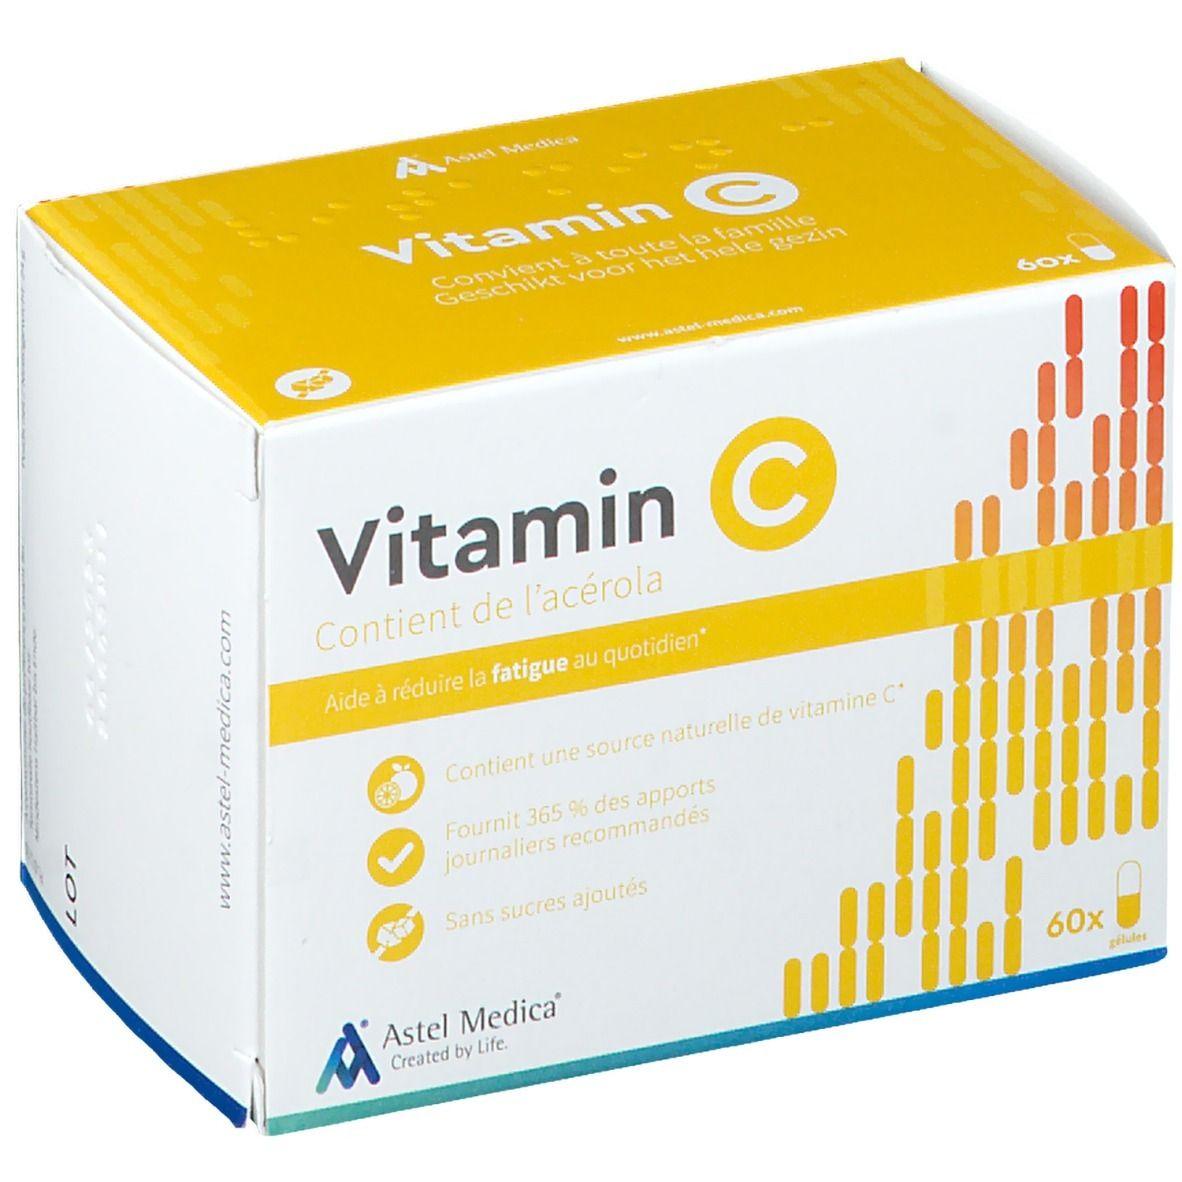 Image of Astel Medica® Vitamin C